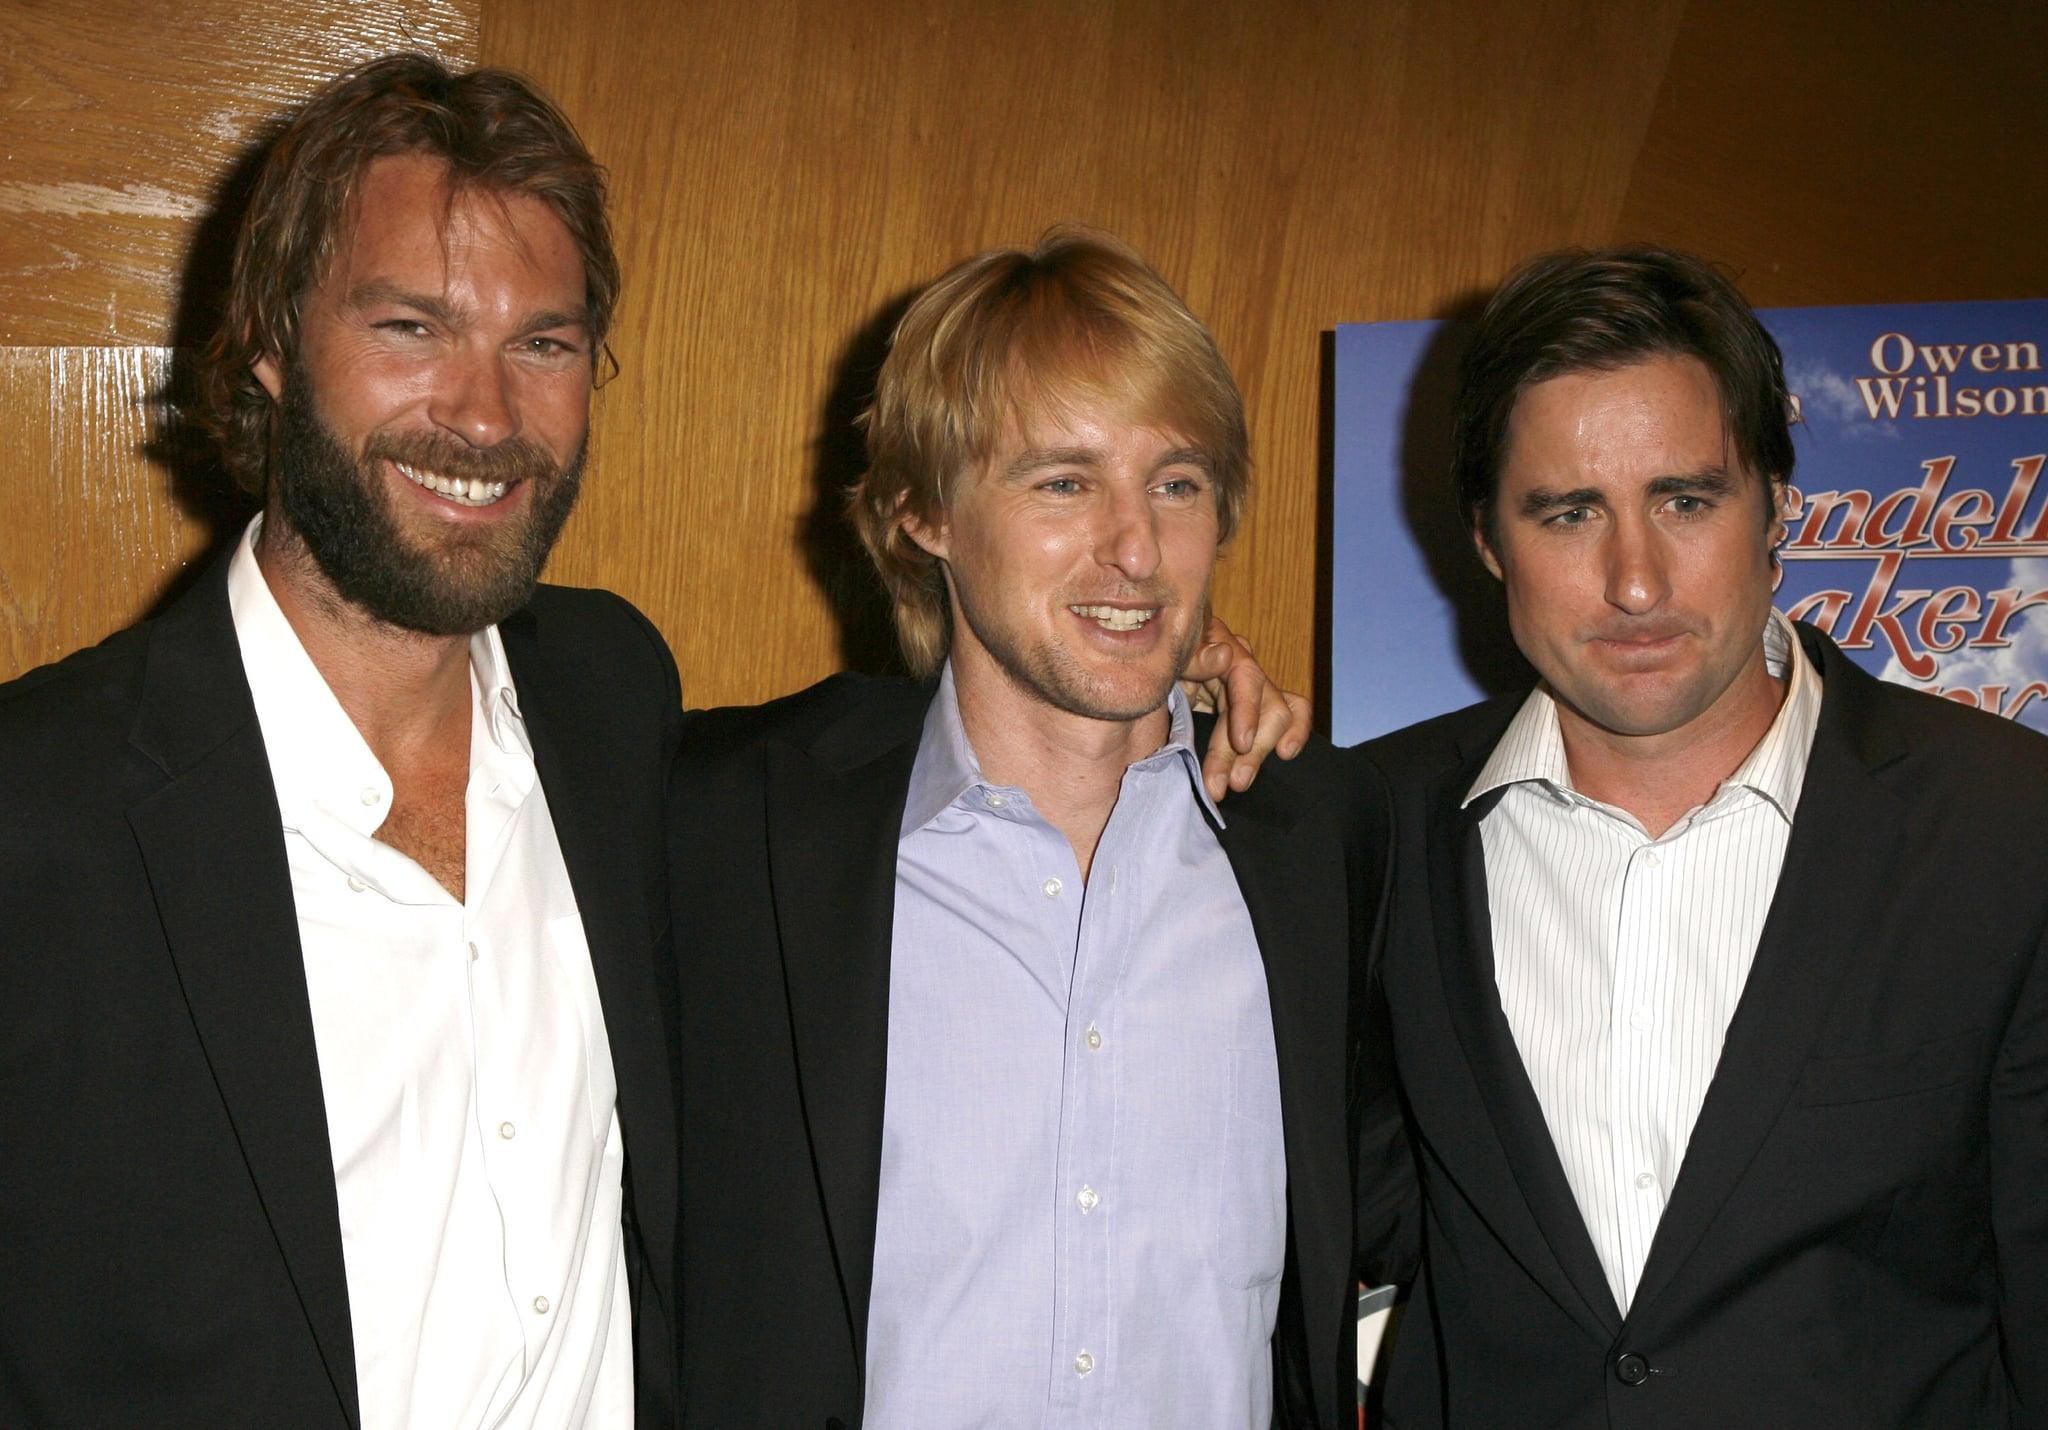 Owen, Luke, and Andrew Wilson | Celebrity Siblings You ...